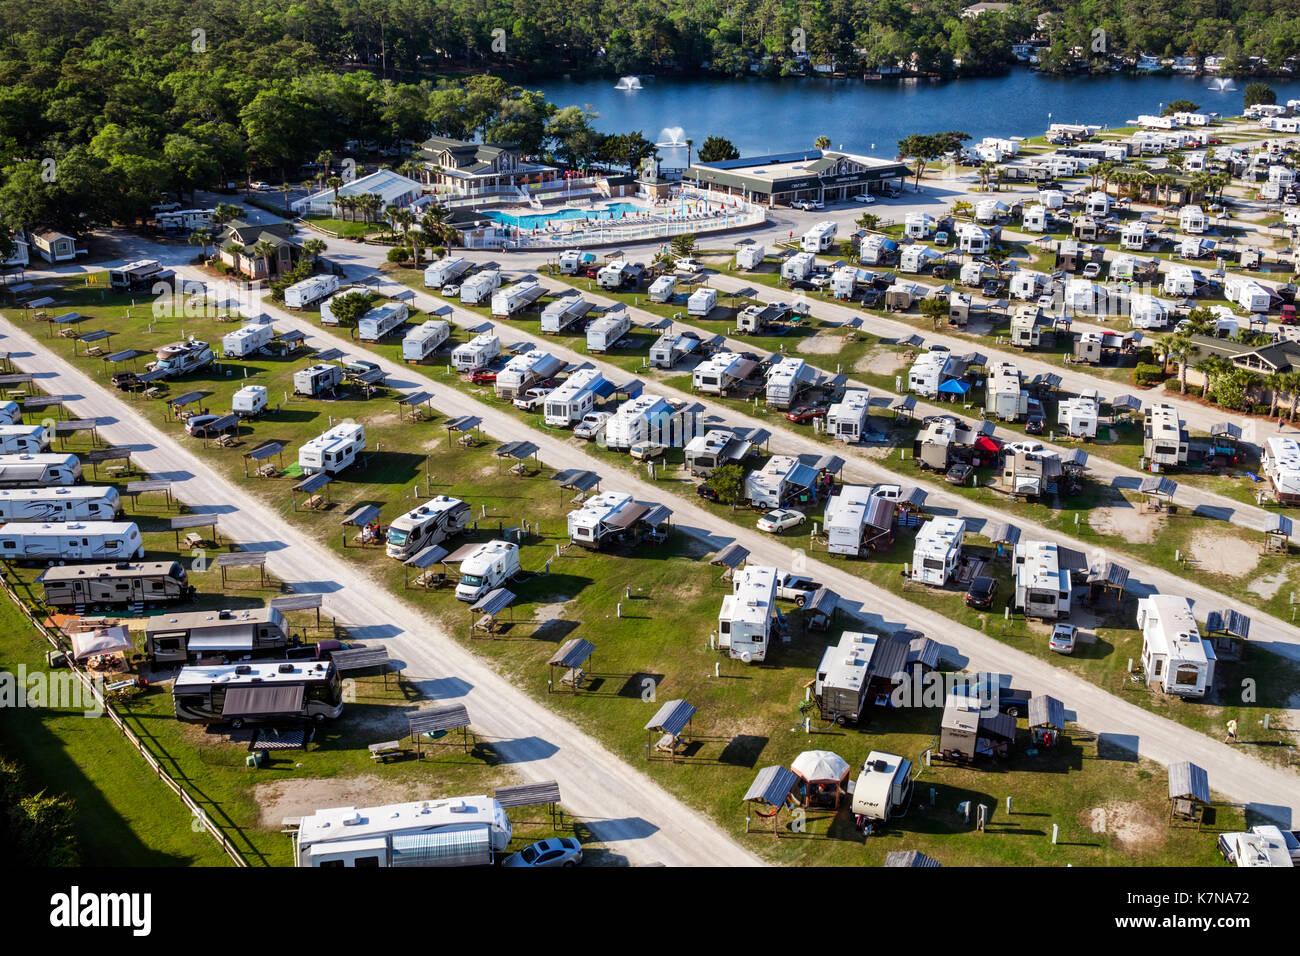 South Carolina SC Atlantic Ocean Myrtle Beach Myrtle Beach RV Travel Park recreational vehicles trailer caravan - Stock Image